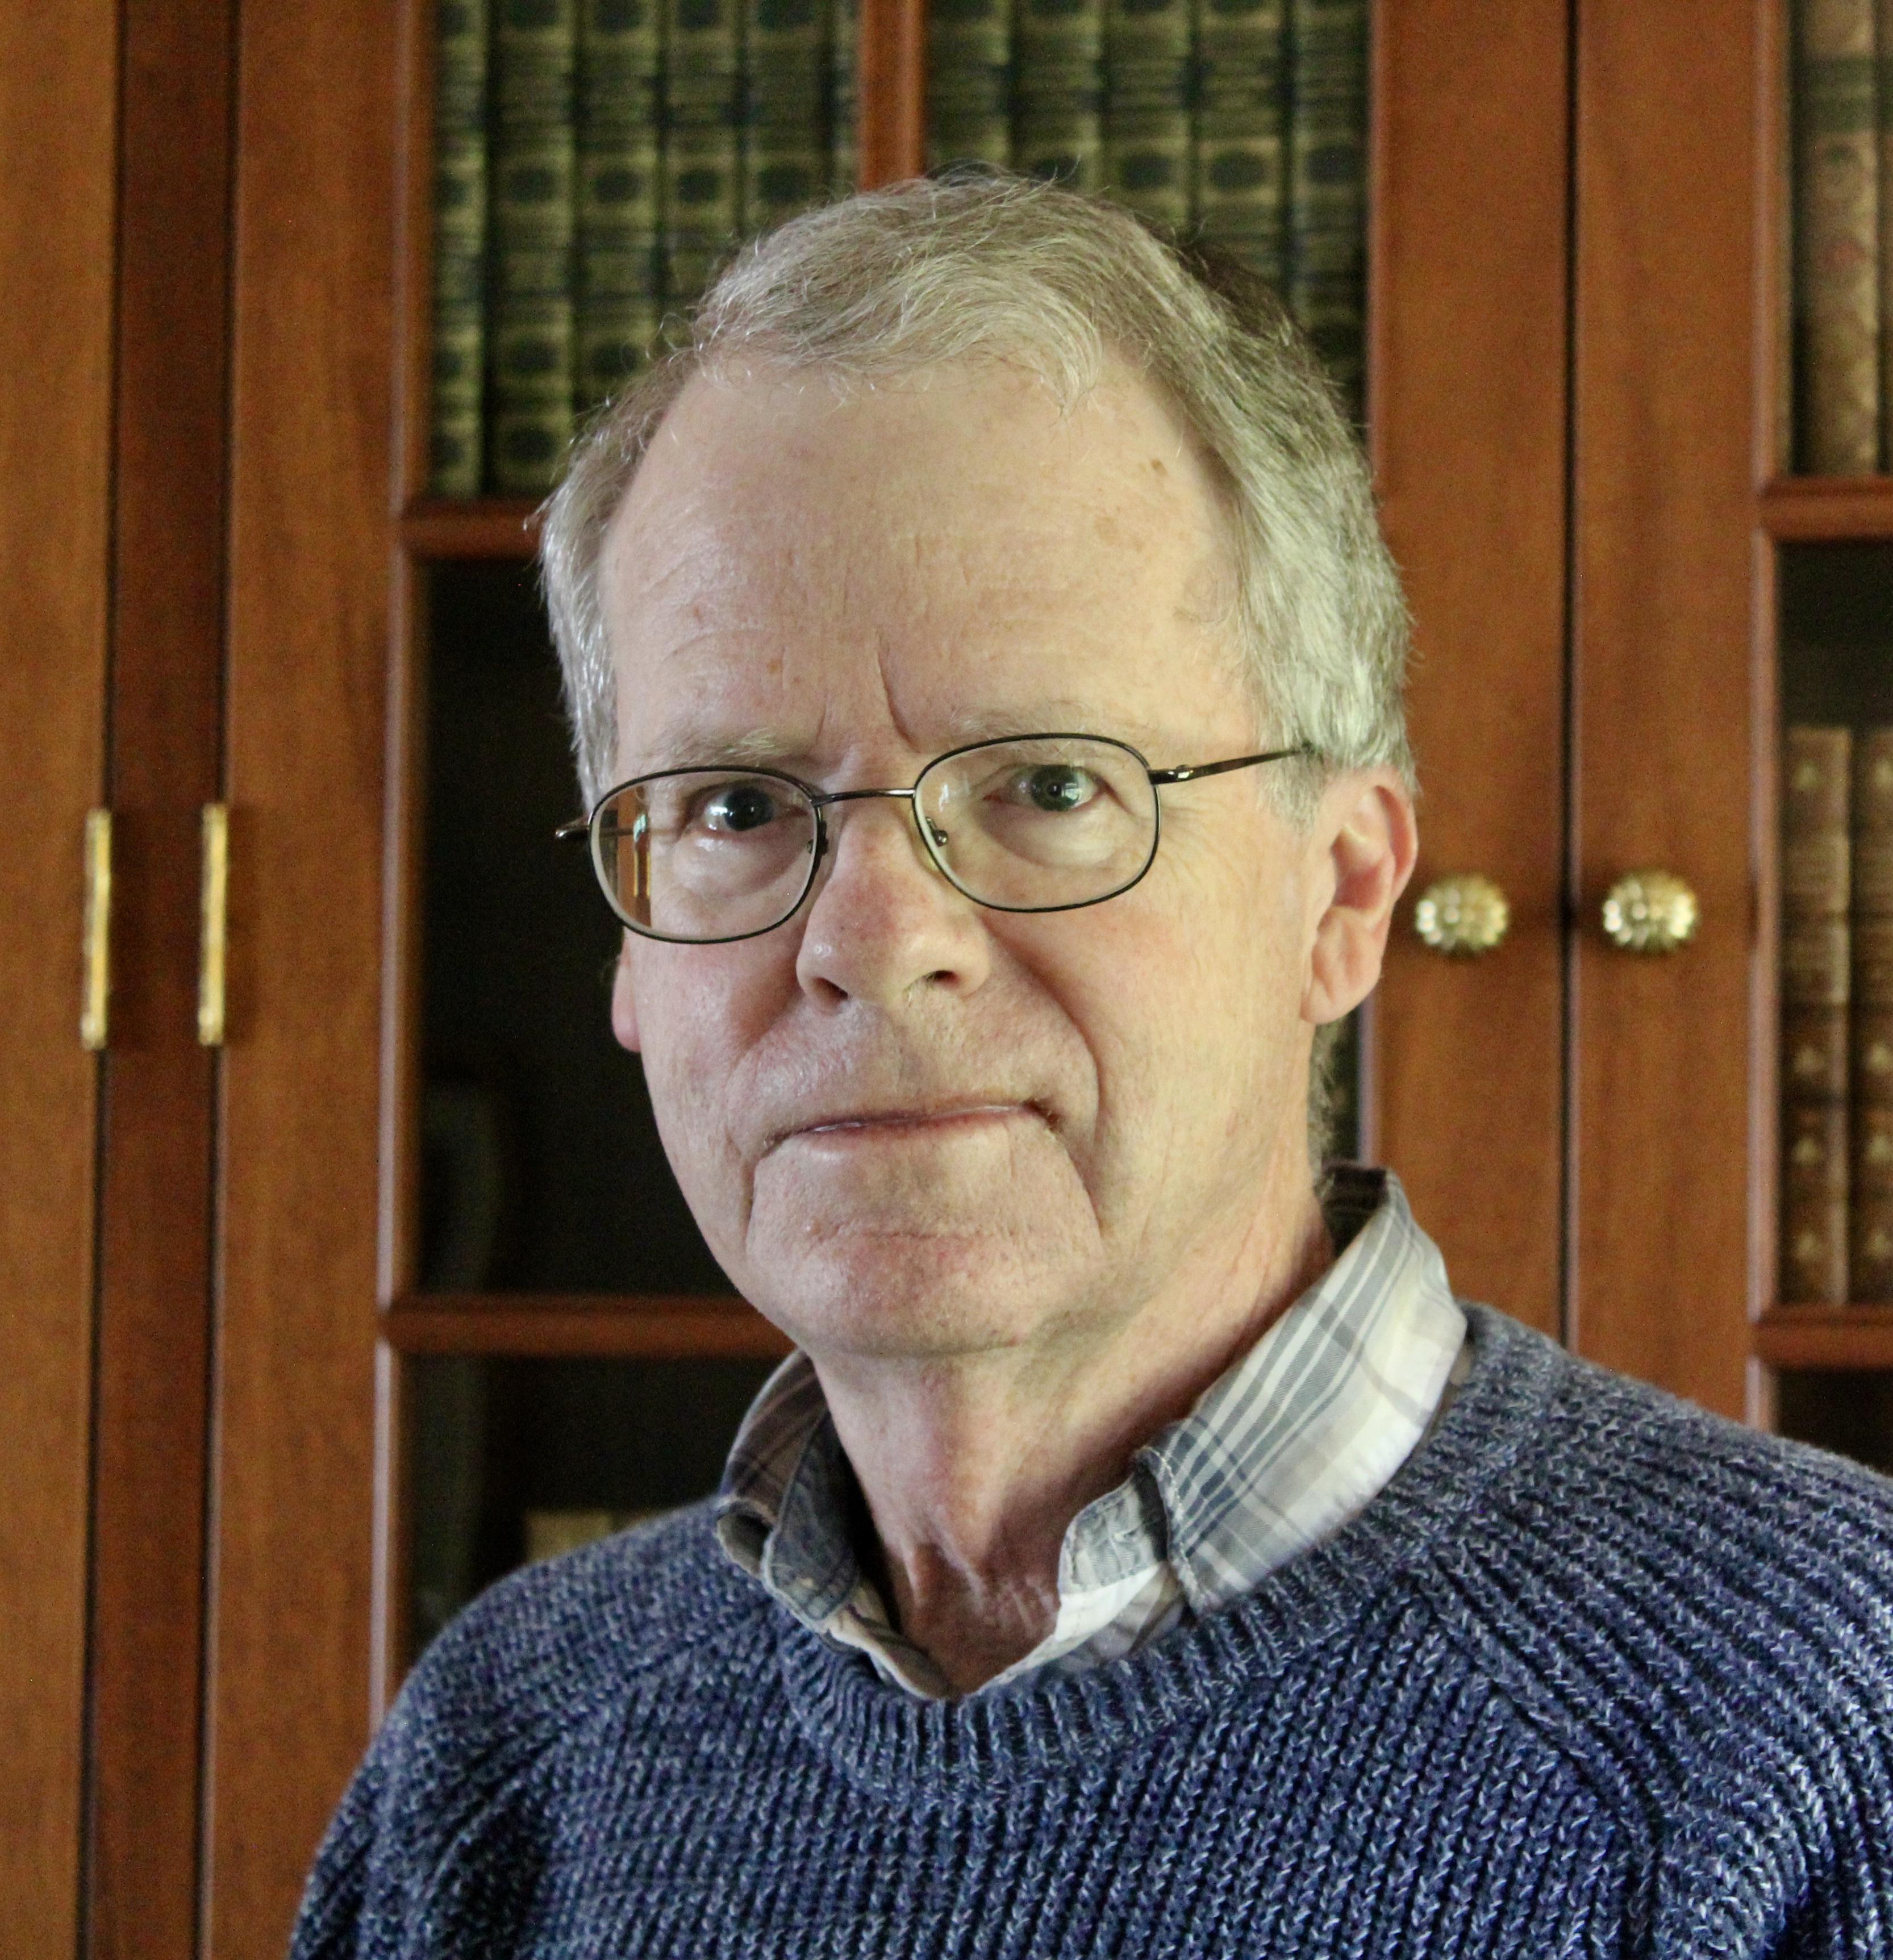 Neurologist Daniel Gibbs